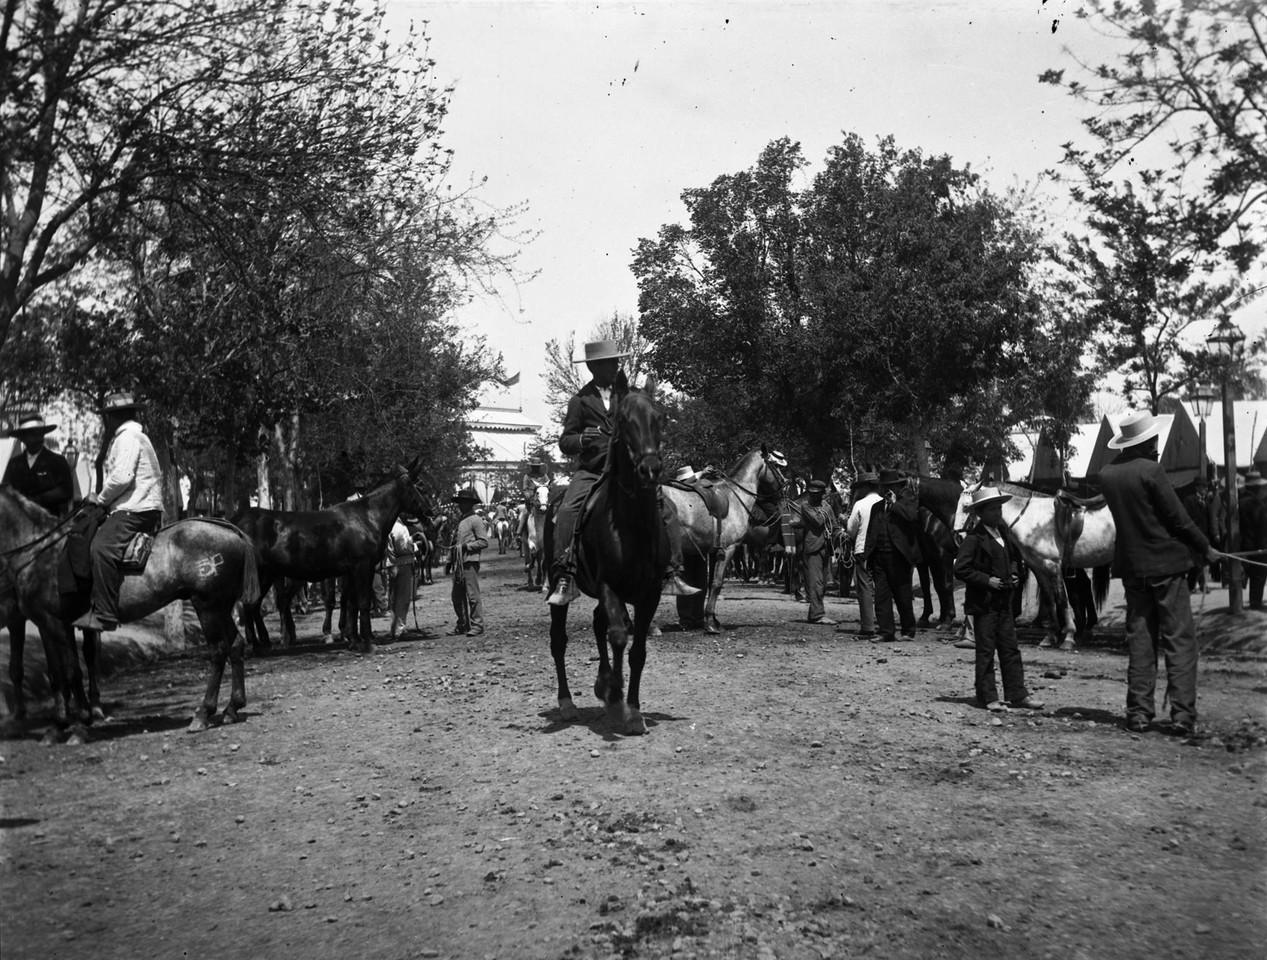 Feira de gado, 1903, fotógrafo ni, in a.f. C.M.L.